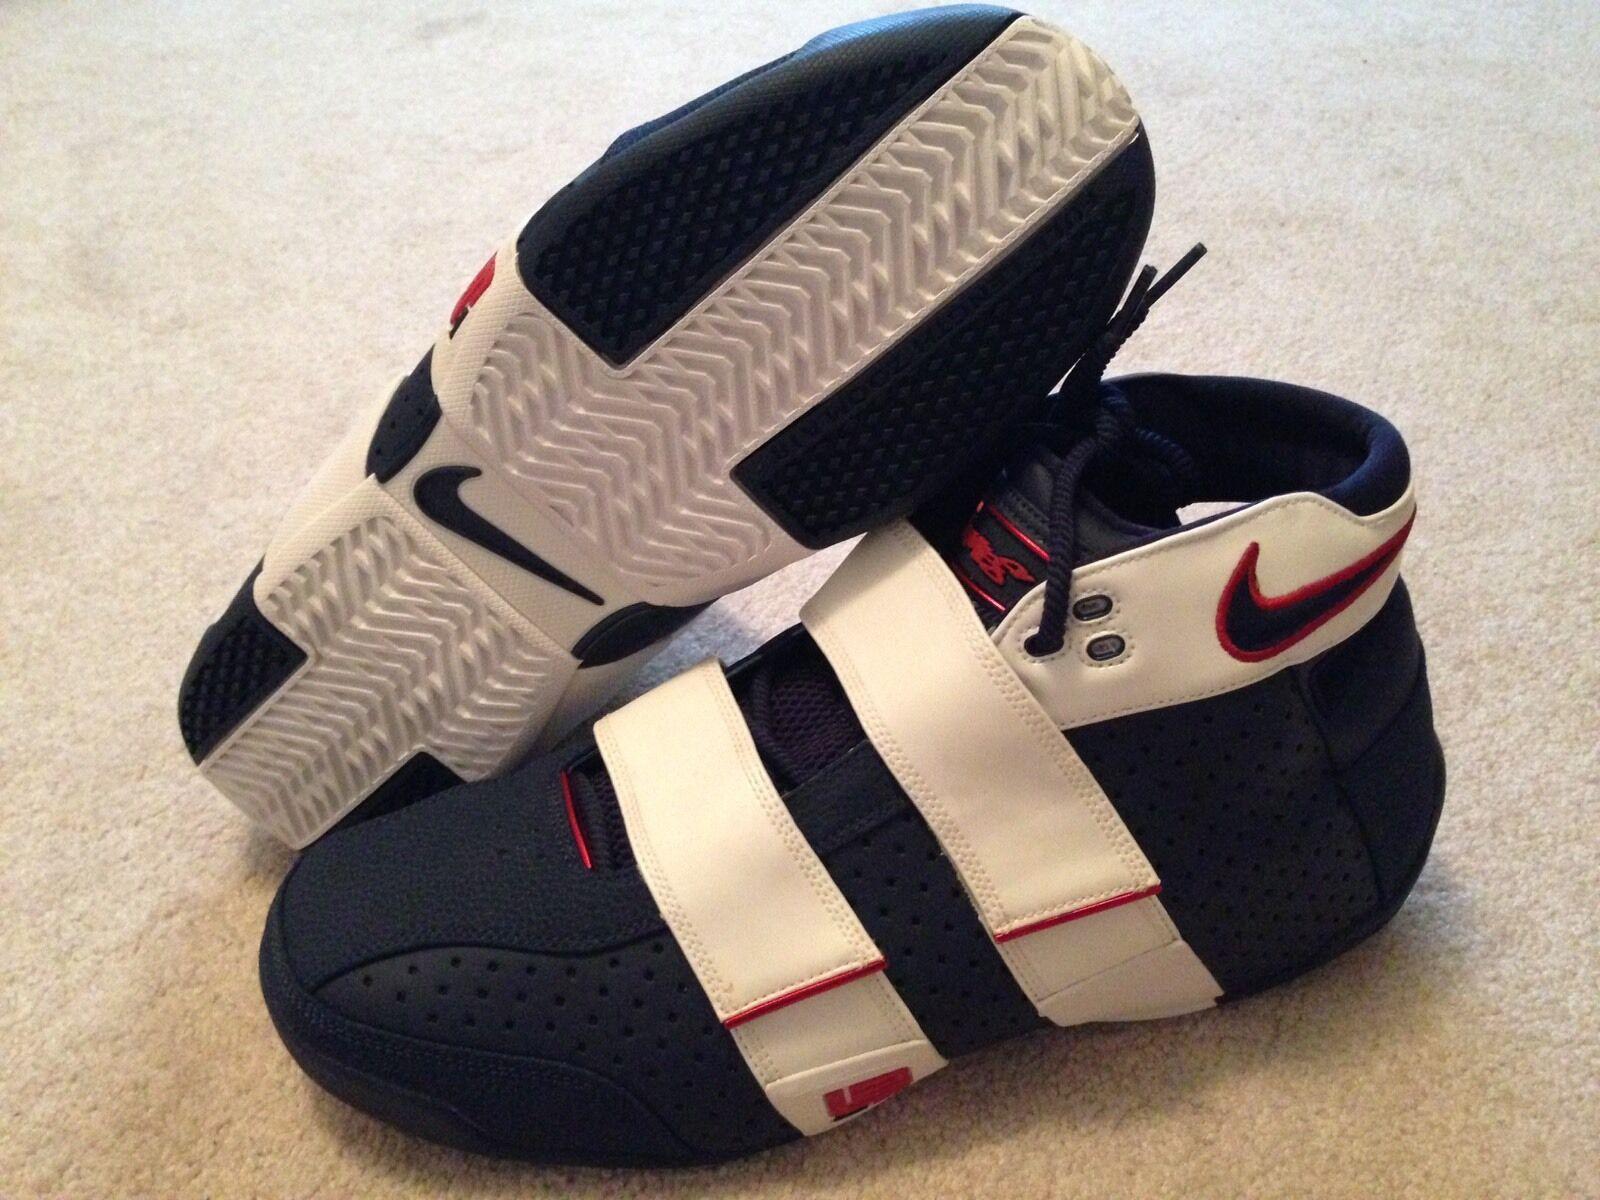 Nike Lebron 20-5-5 USA Alternate PE Sz 16 Rare Promo Sample Player Exclusive